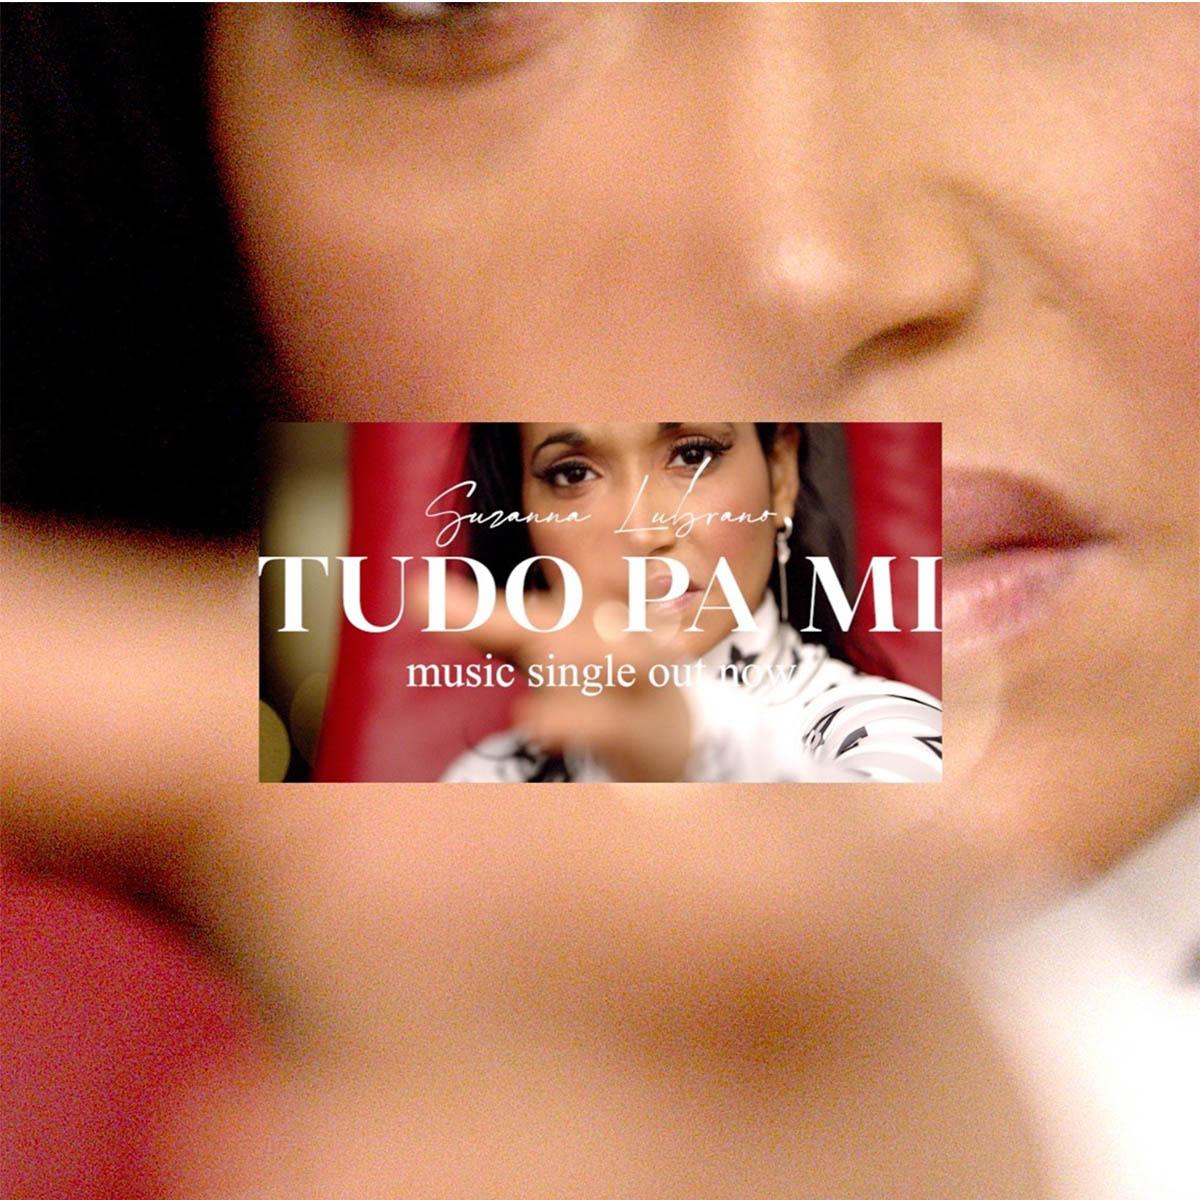 Suzanna Lubrano - Tudo Pa Mi